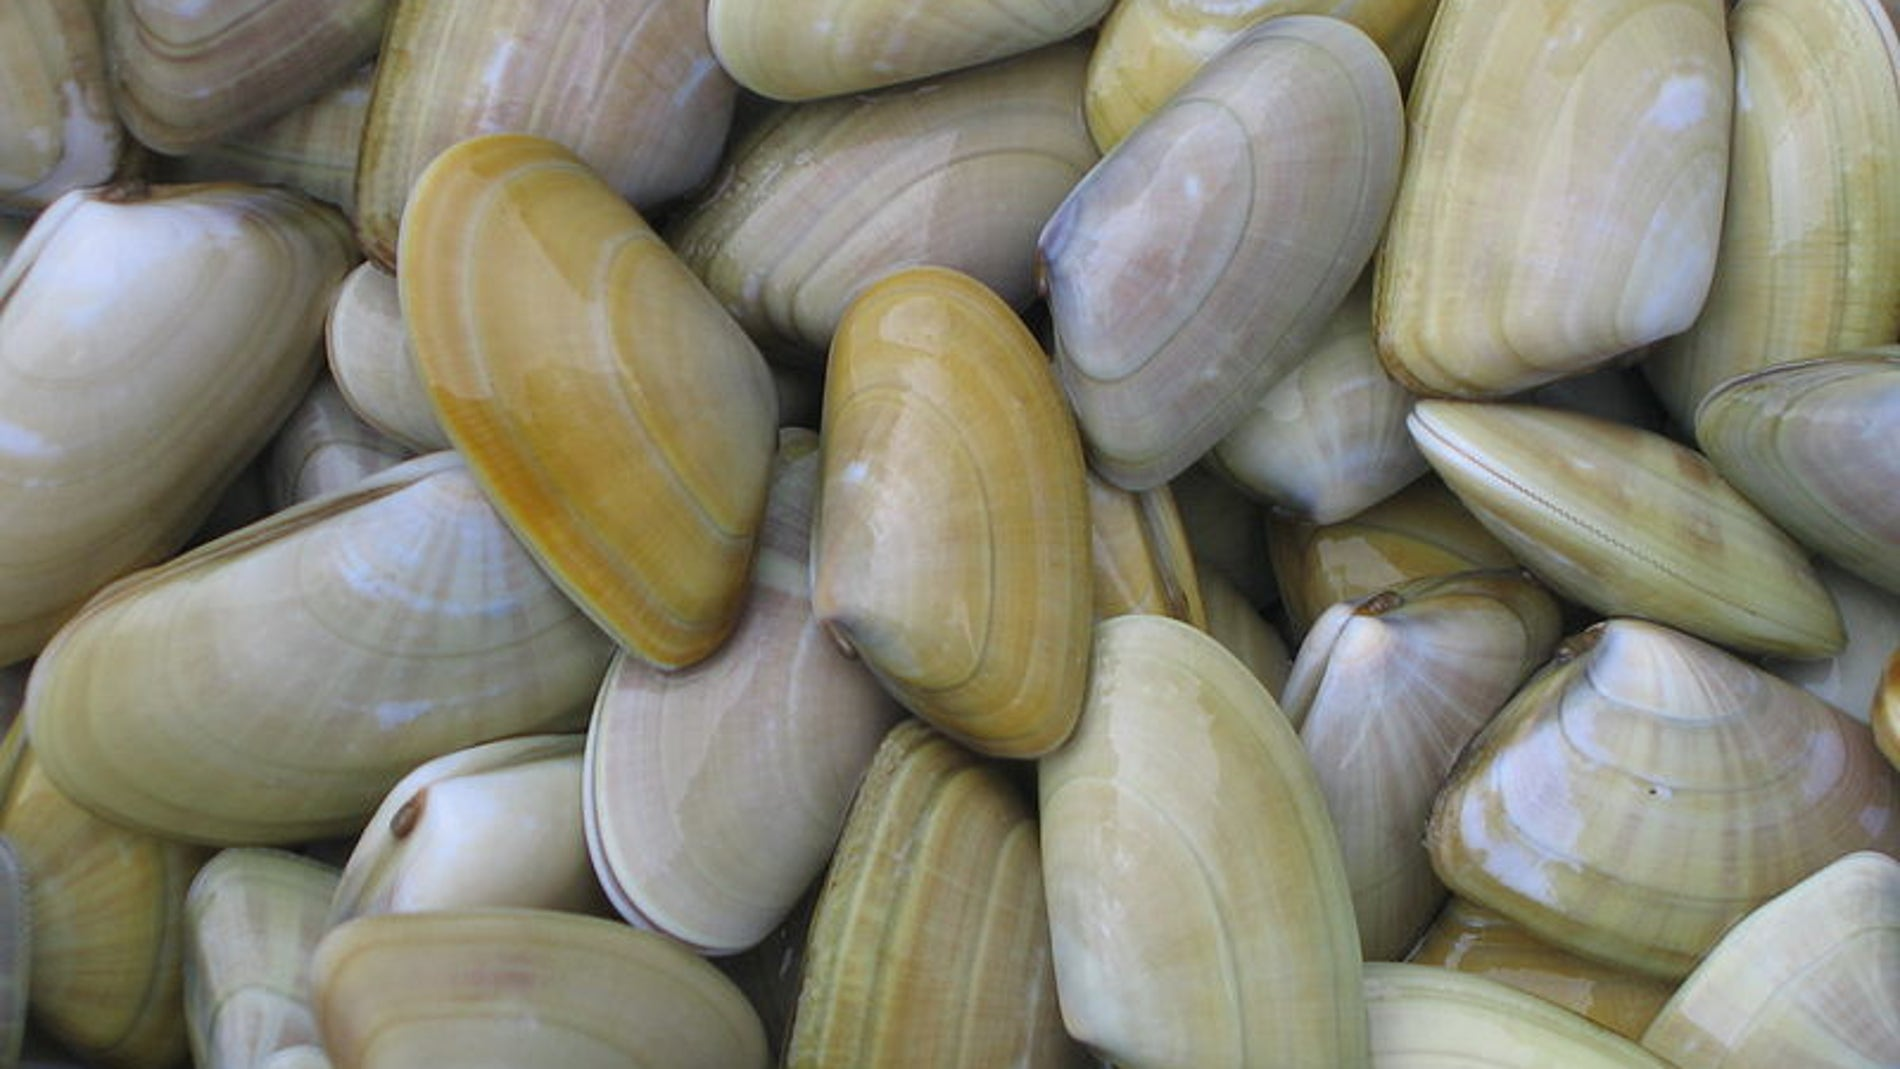 Donax trunculus, nombre común de las coquinas o tellinas